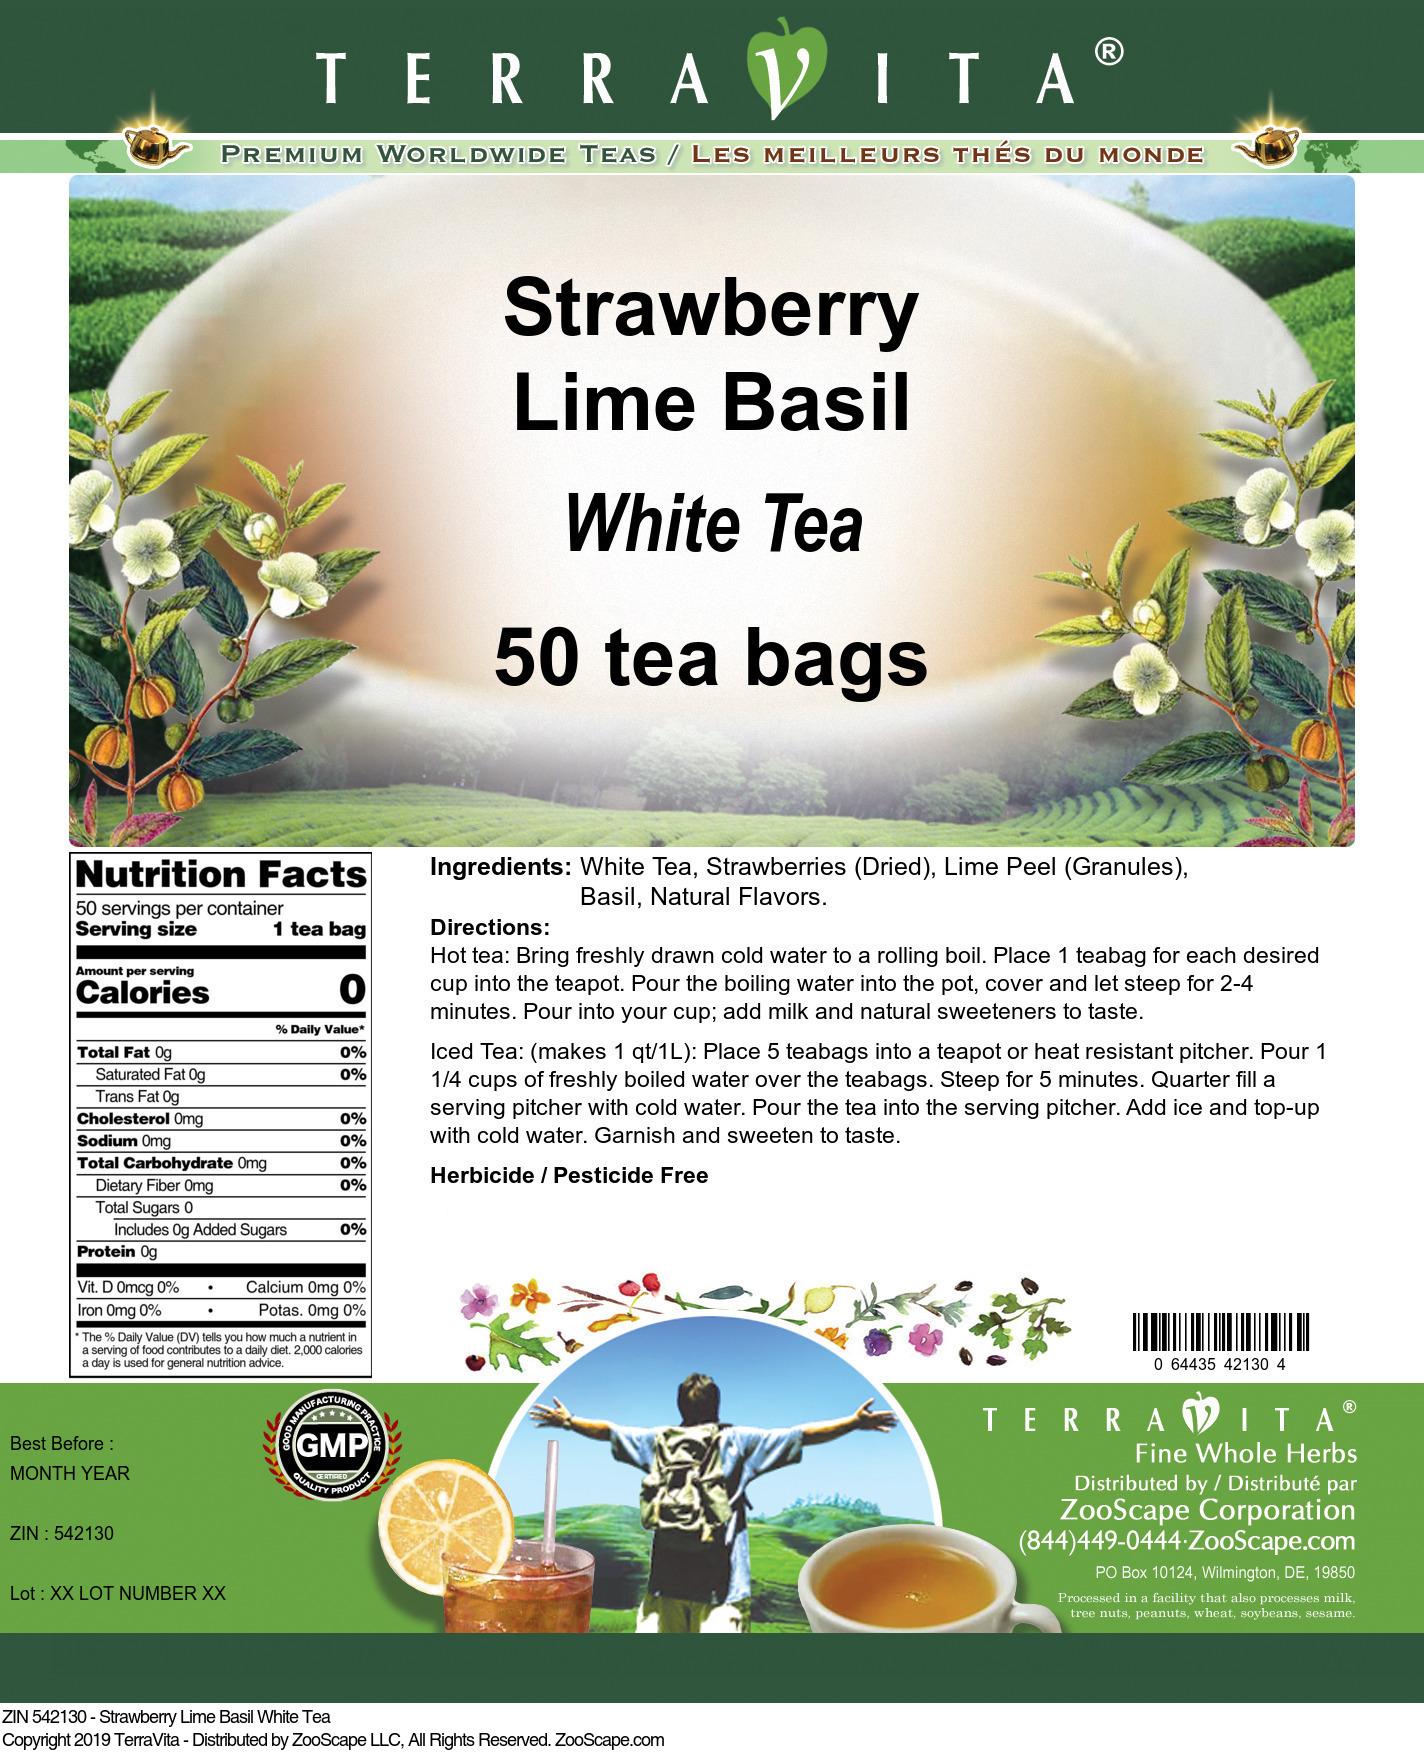 Strawberry Lime Basil White Tea